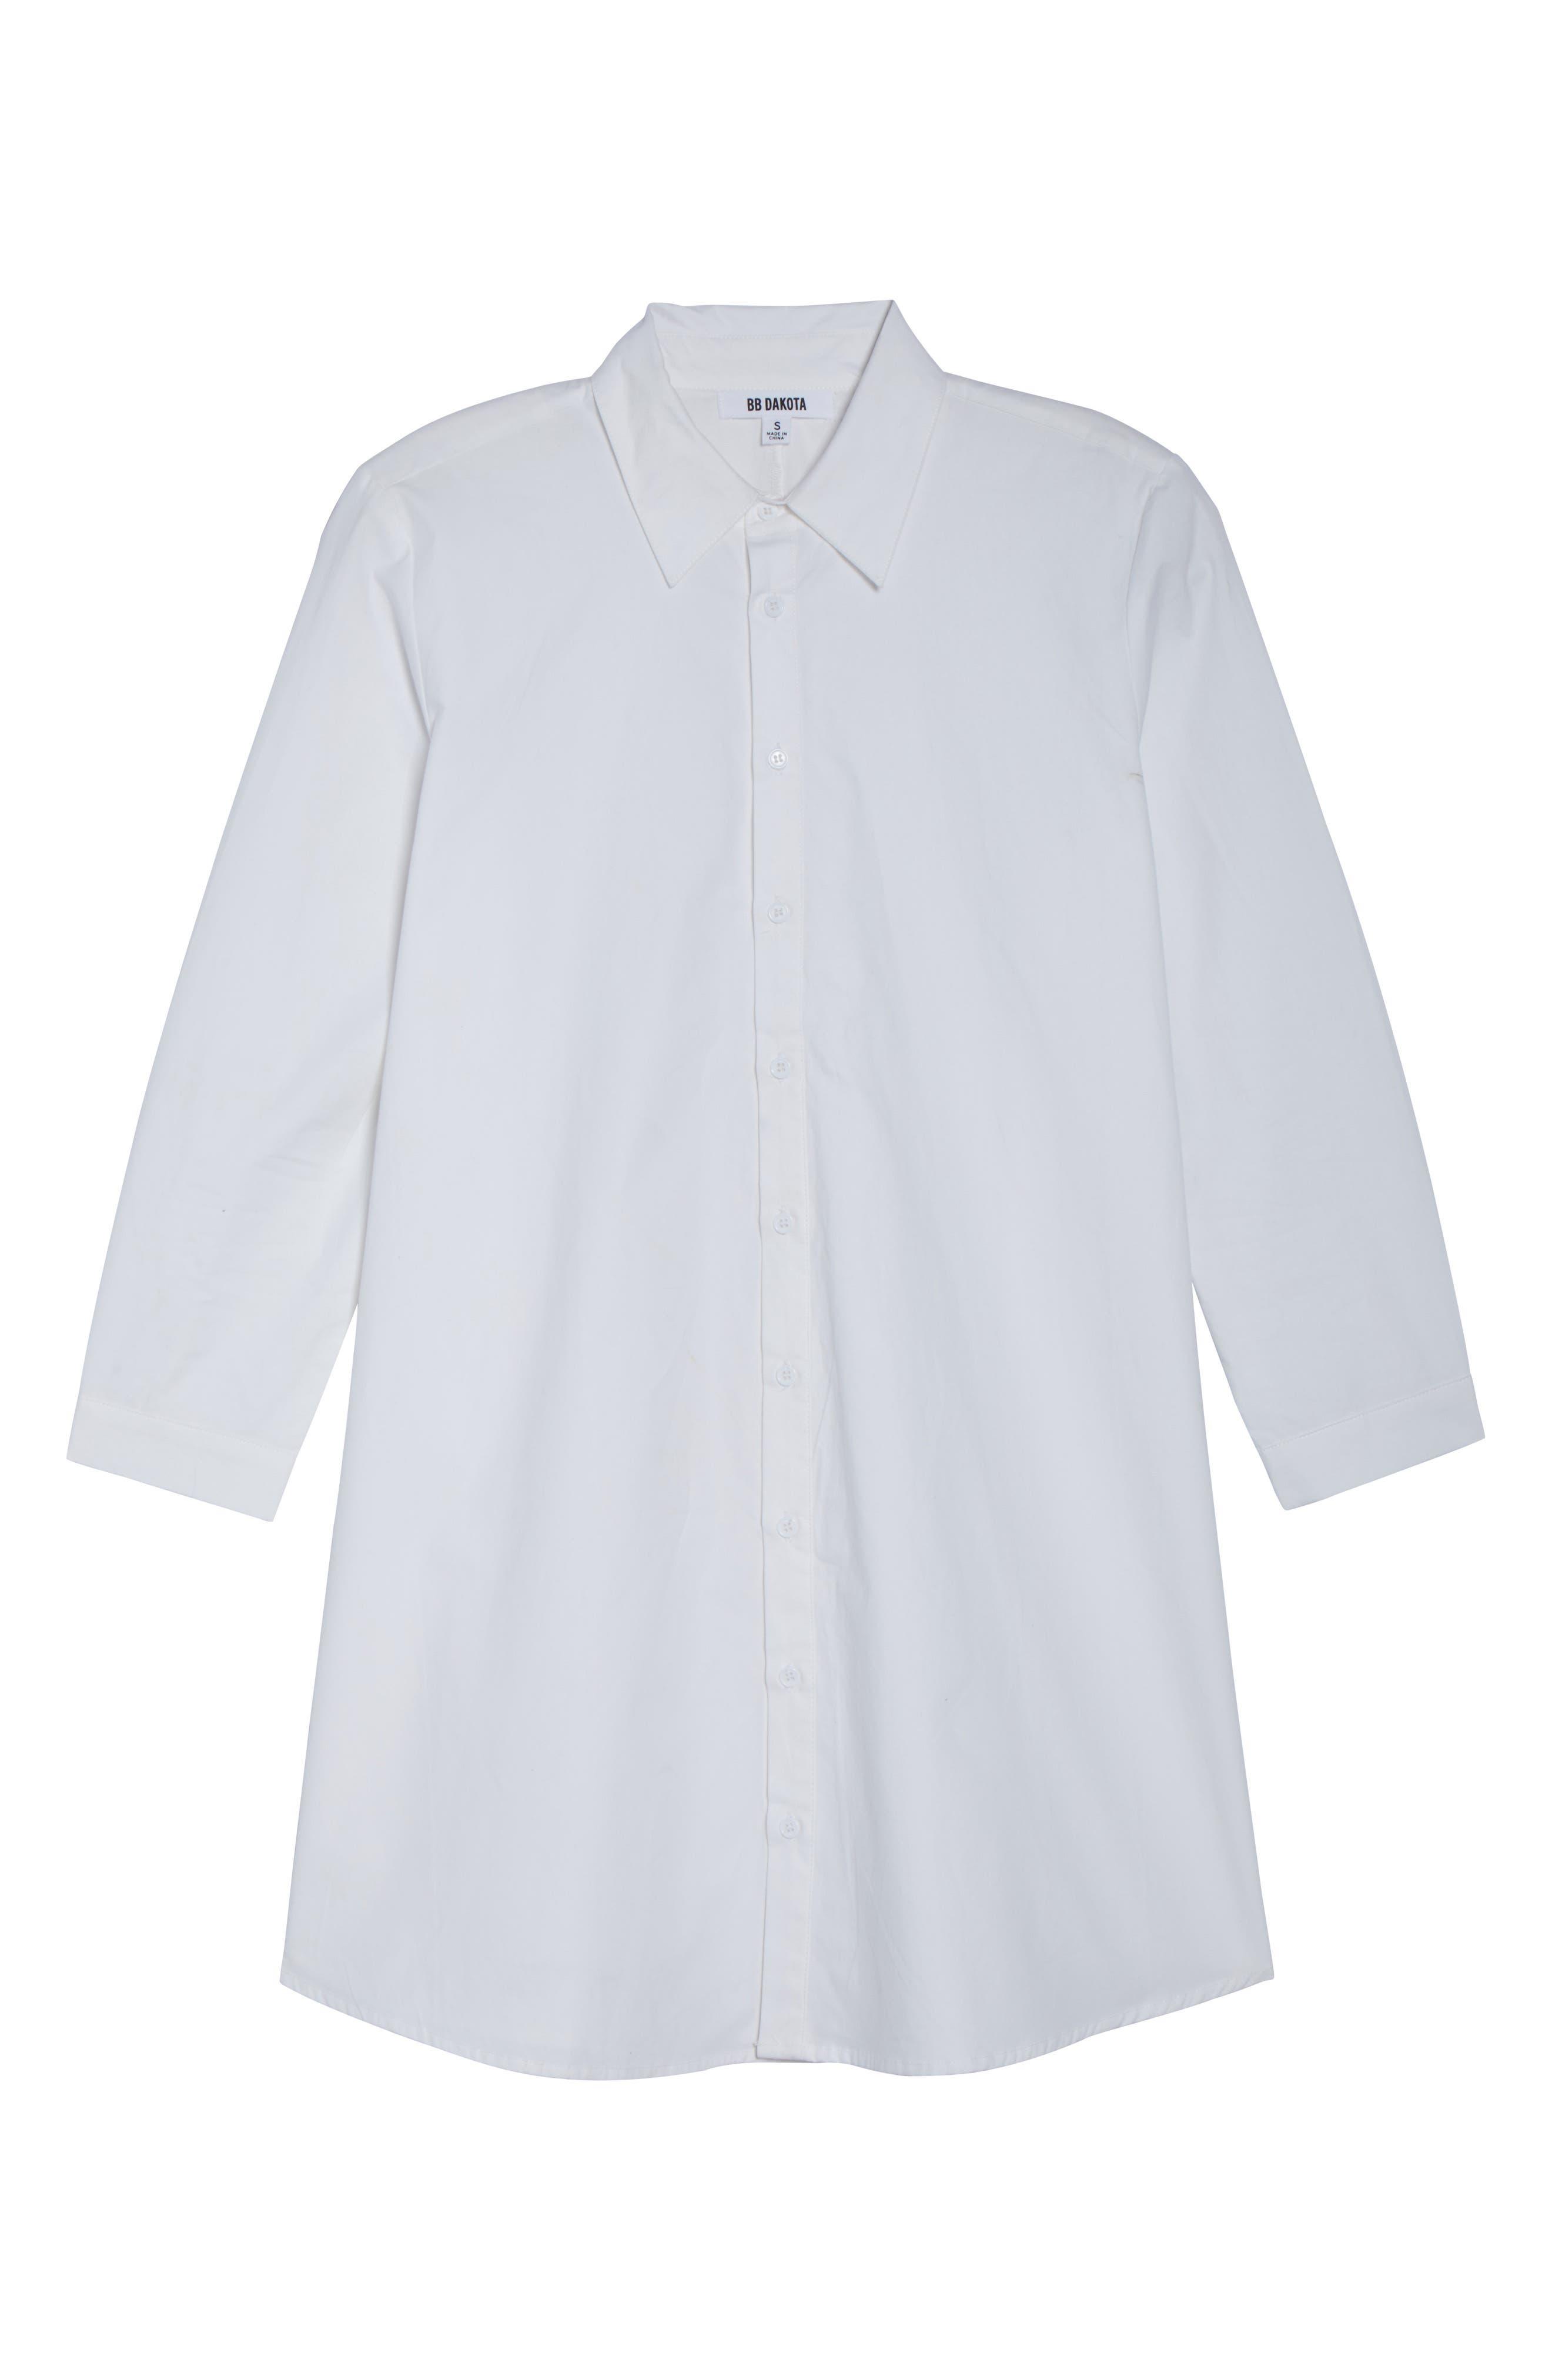 Colt Cotton Poplin Shirtdress,                             Alternate thumbnail 7, color,                             110